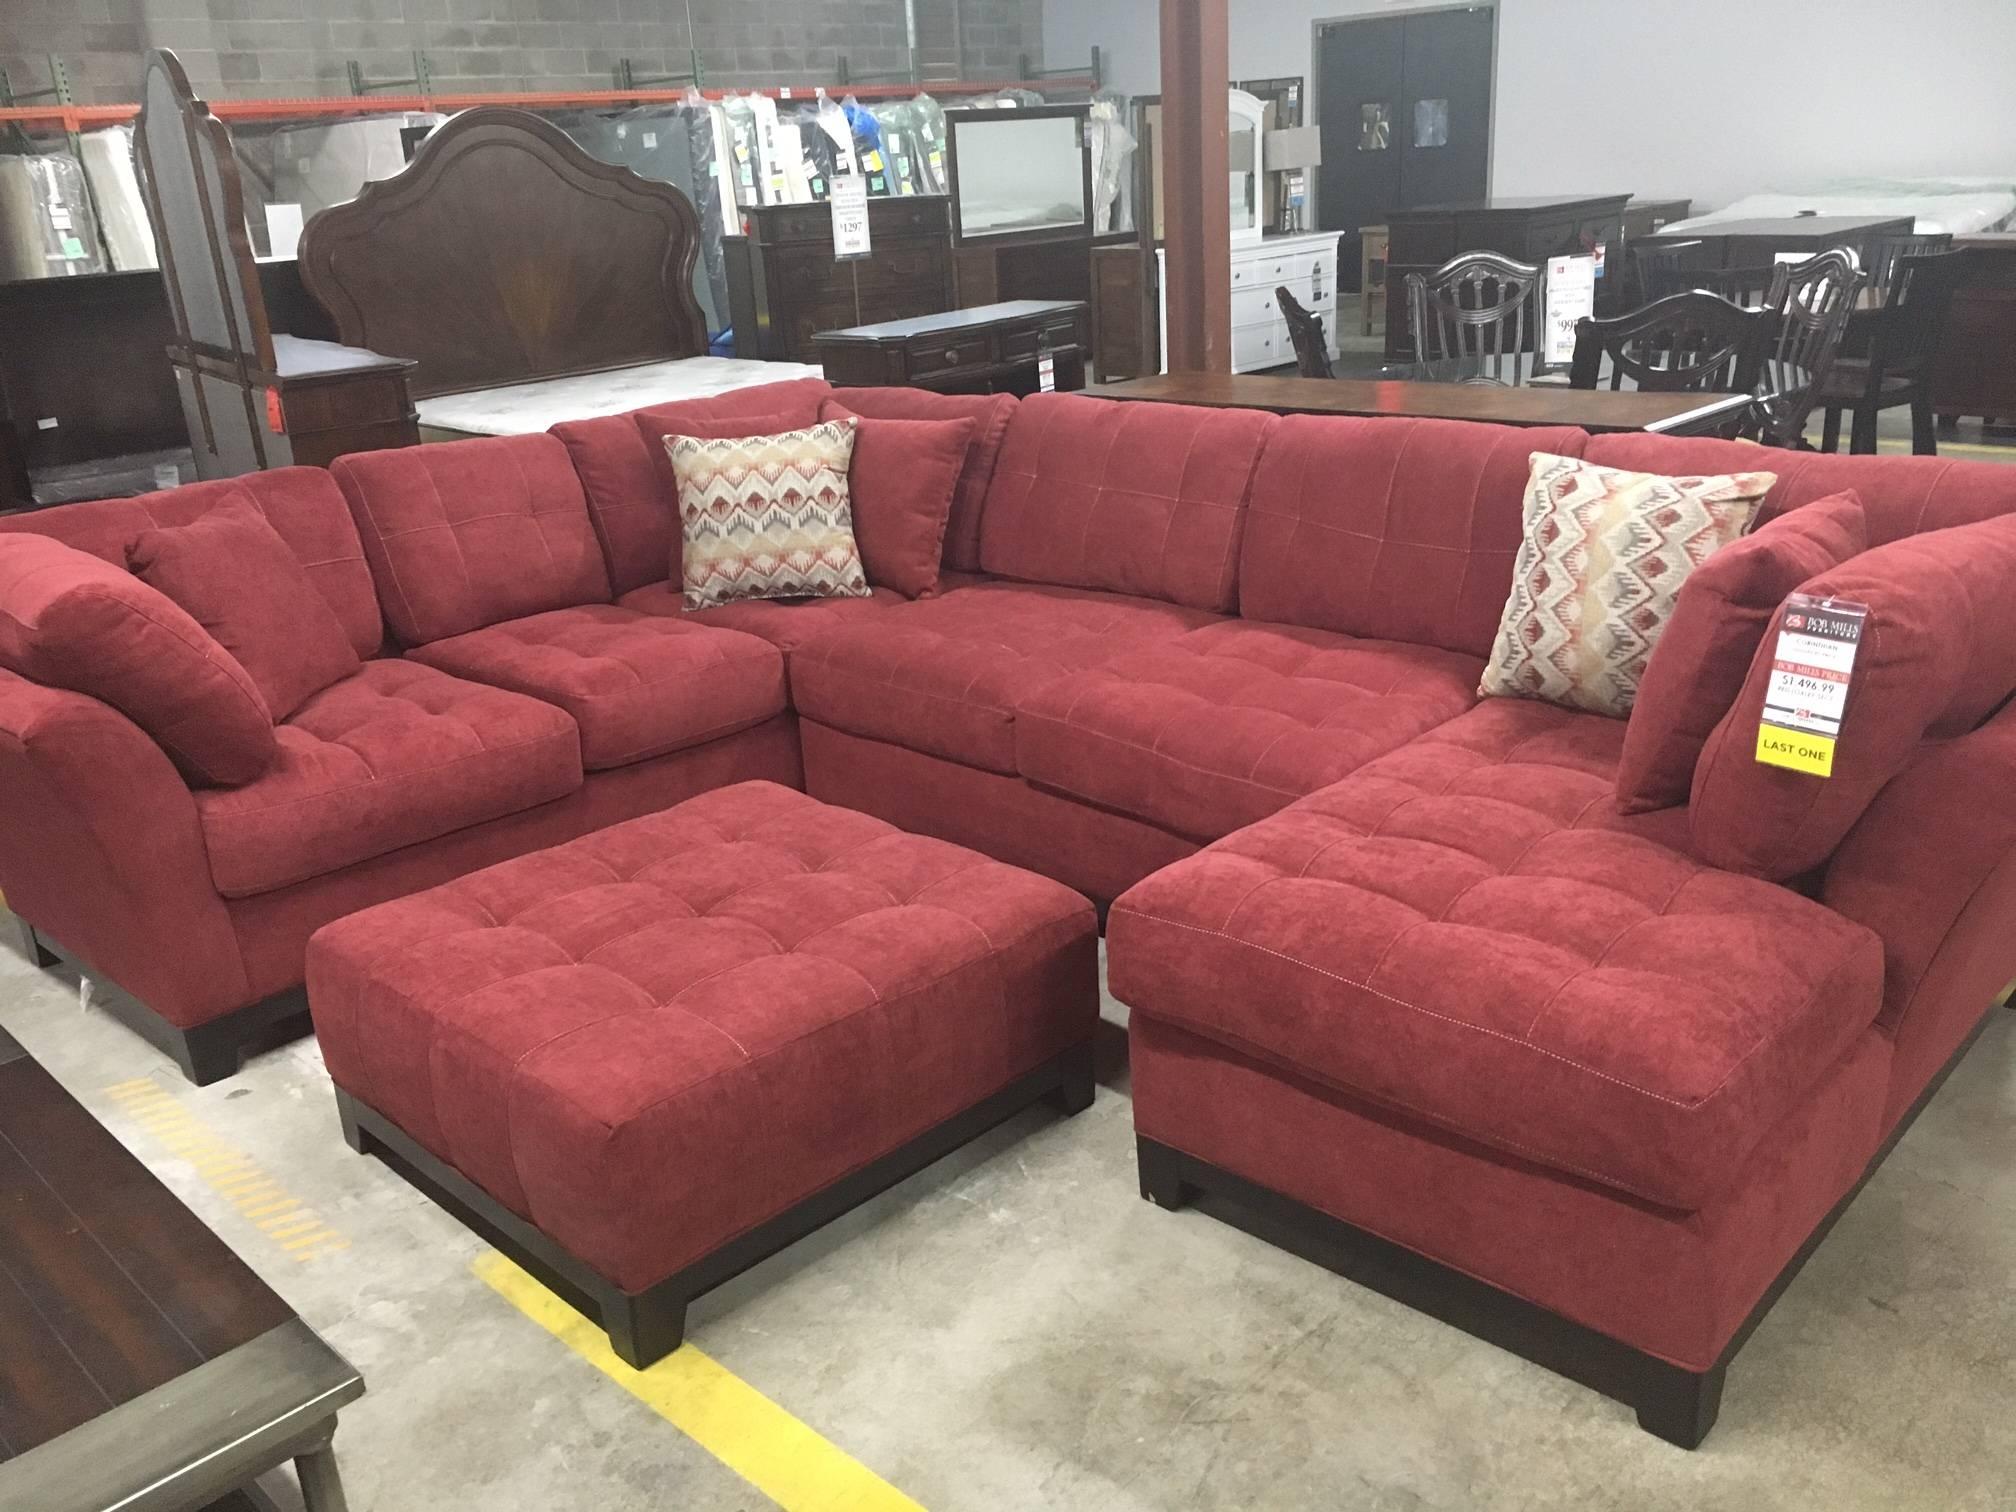 Corinthian Loxley Sectional Sofa - Bob Mills Furniture Okc with regard to Corinthian Sectional Sofas (Image 15 of 30)